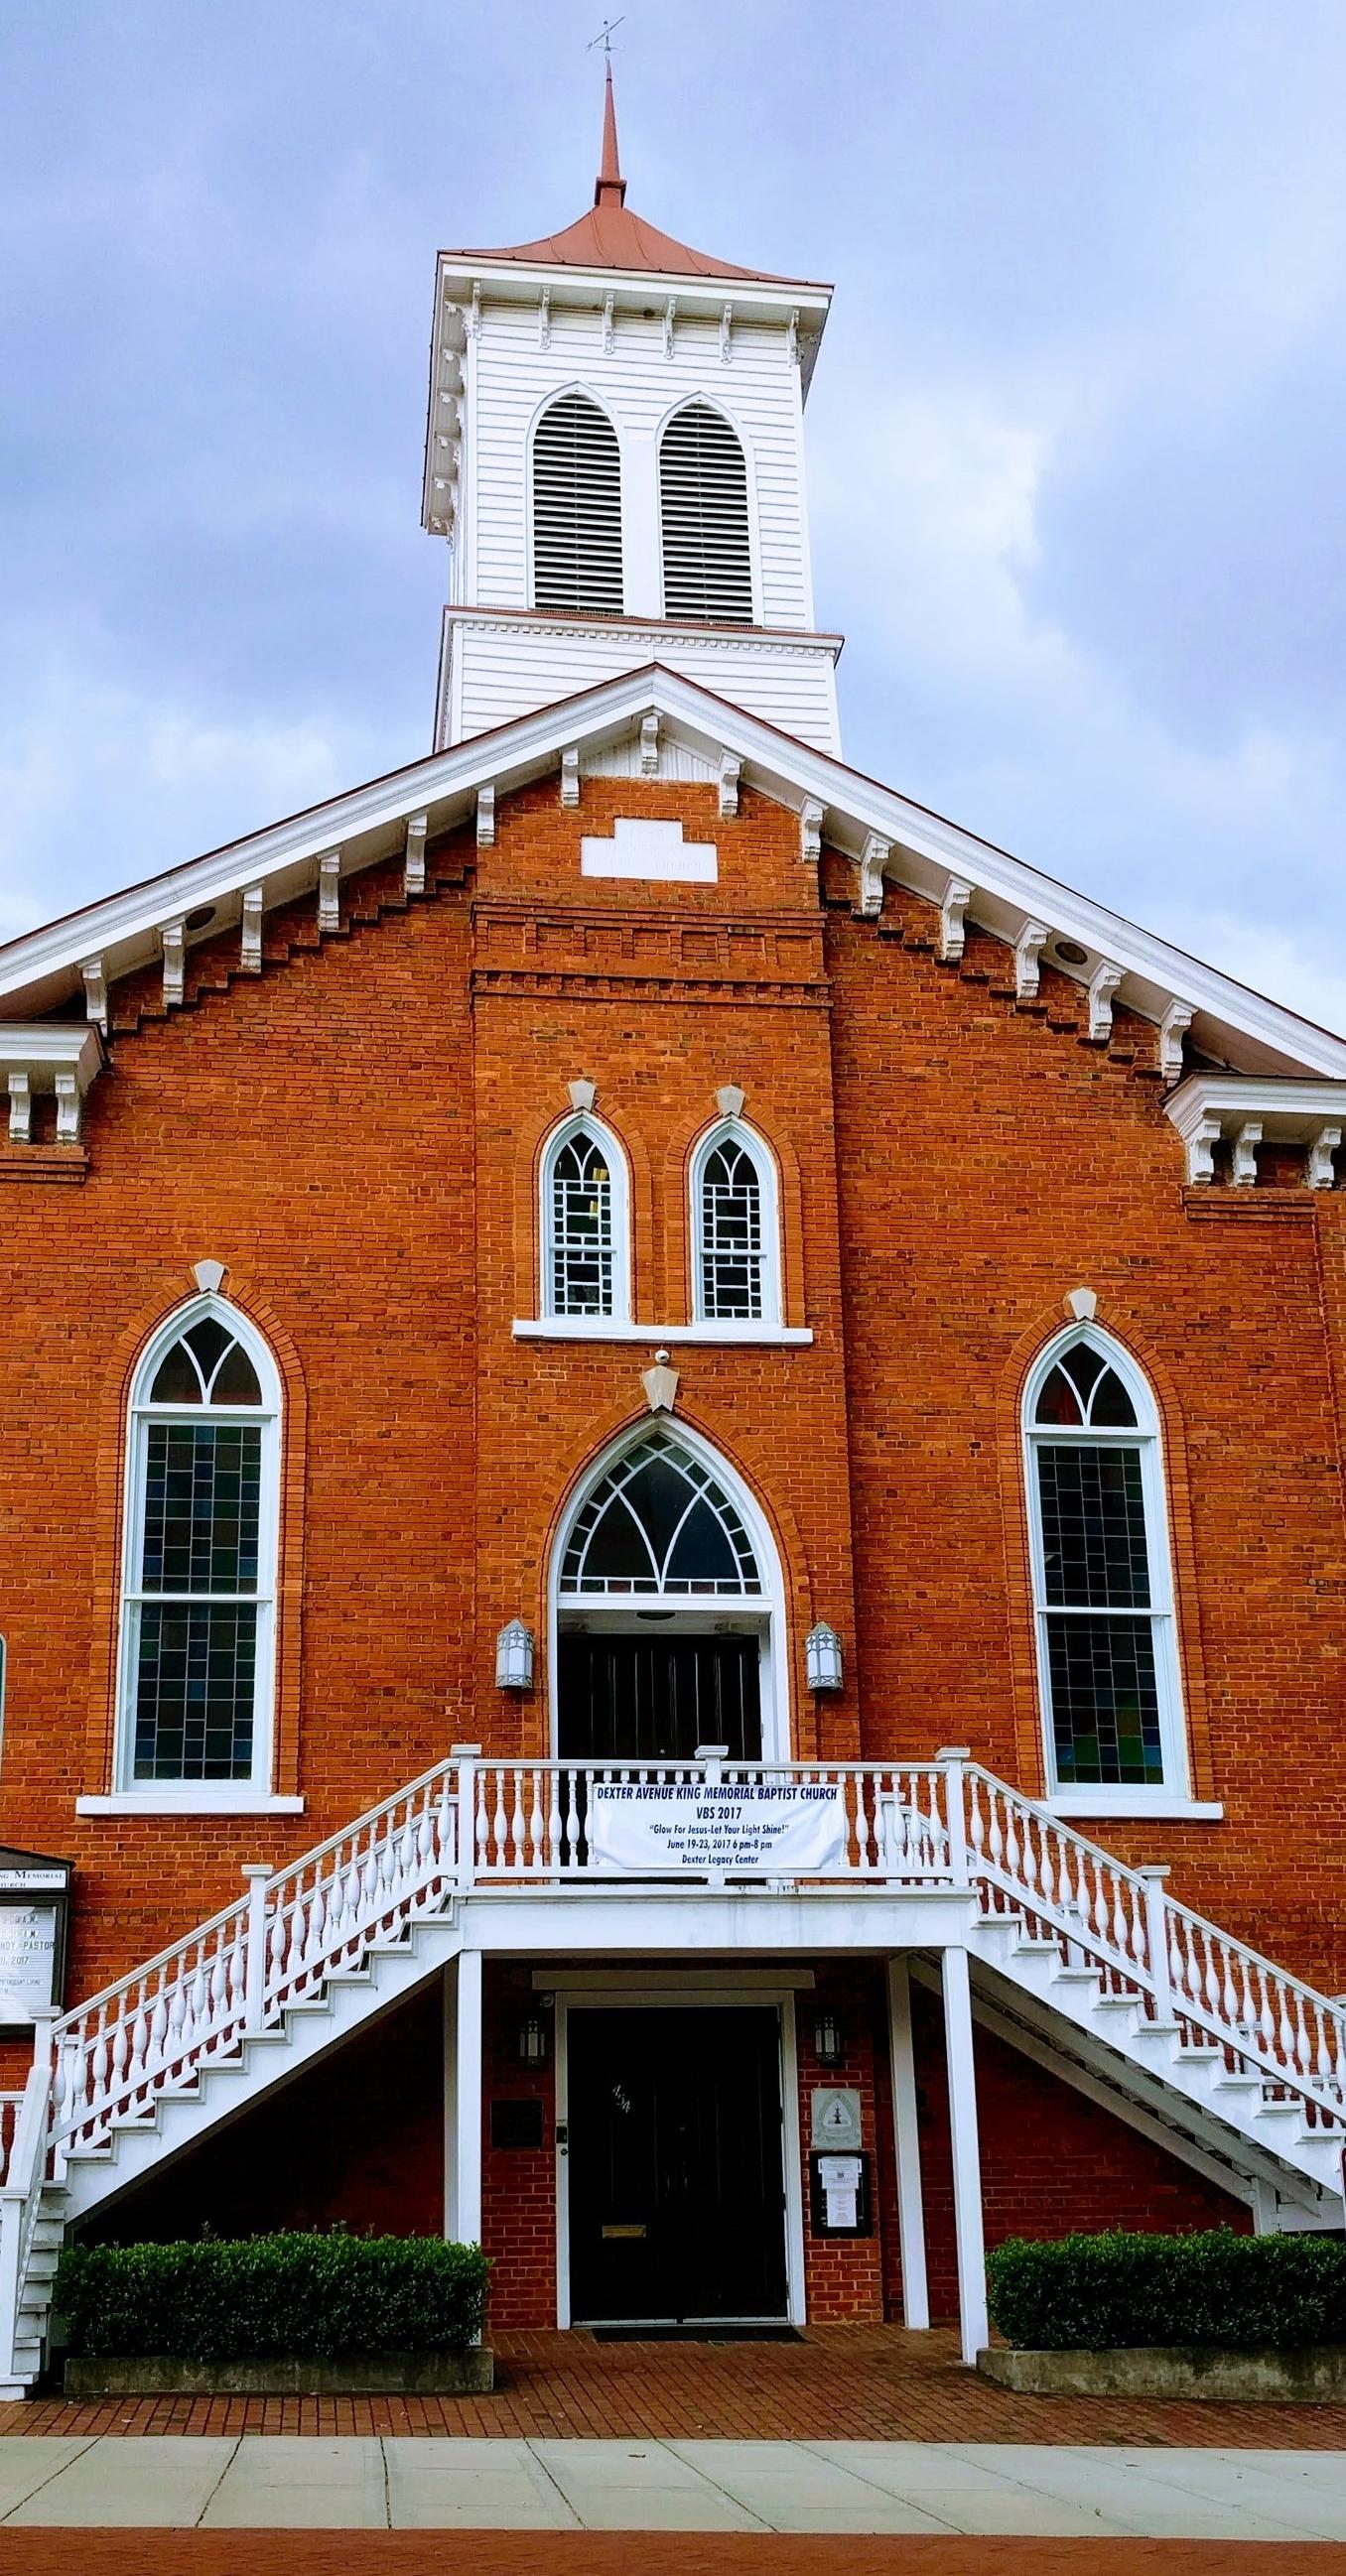 Dexter Avenue Baptist Church- Martin Luther King Jr's church